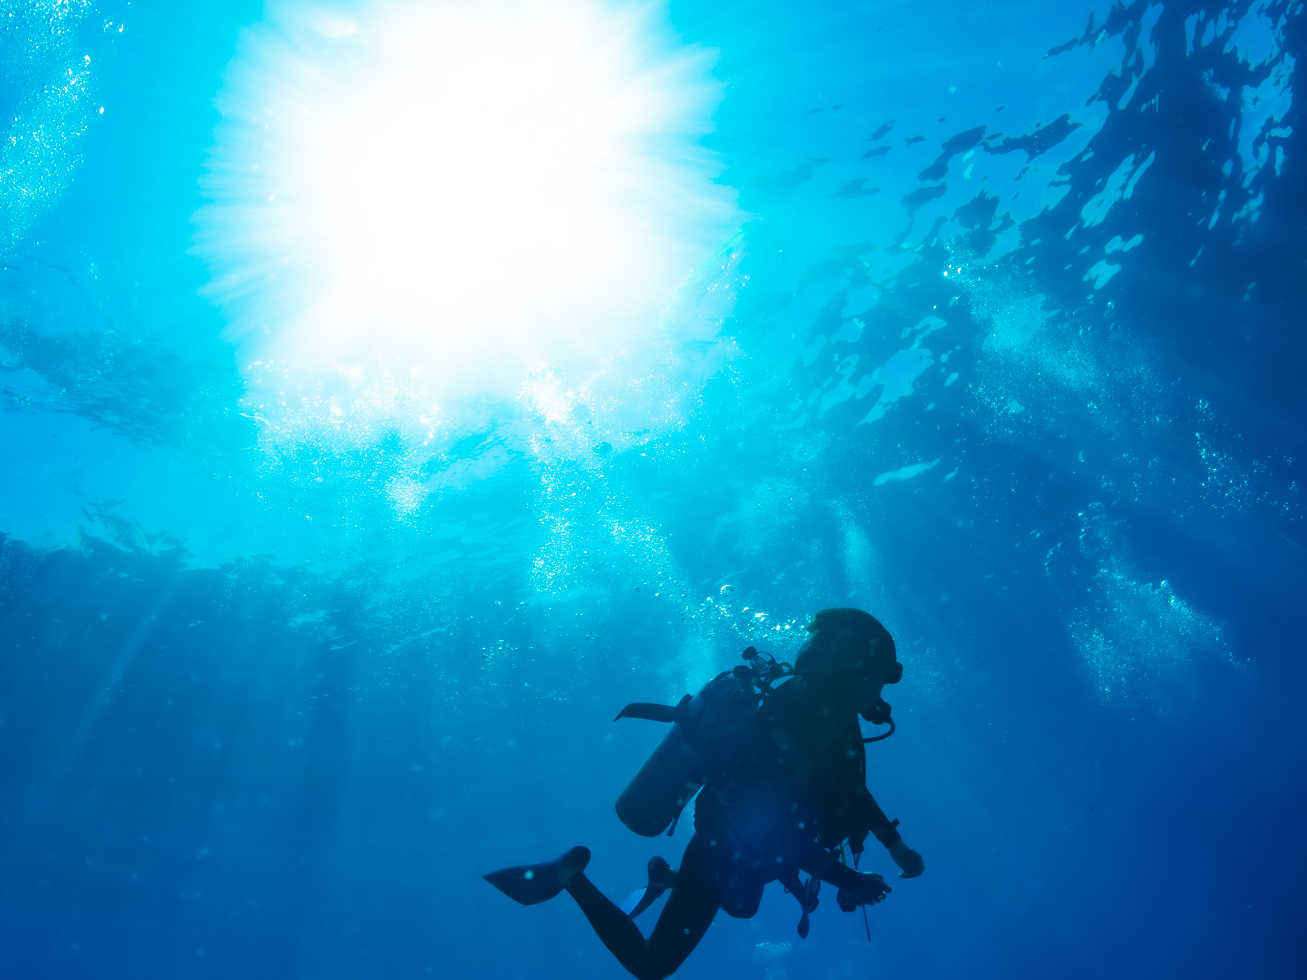 Scuba DivingのScubaってどういう意味?